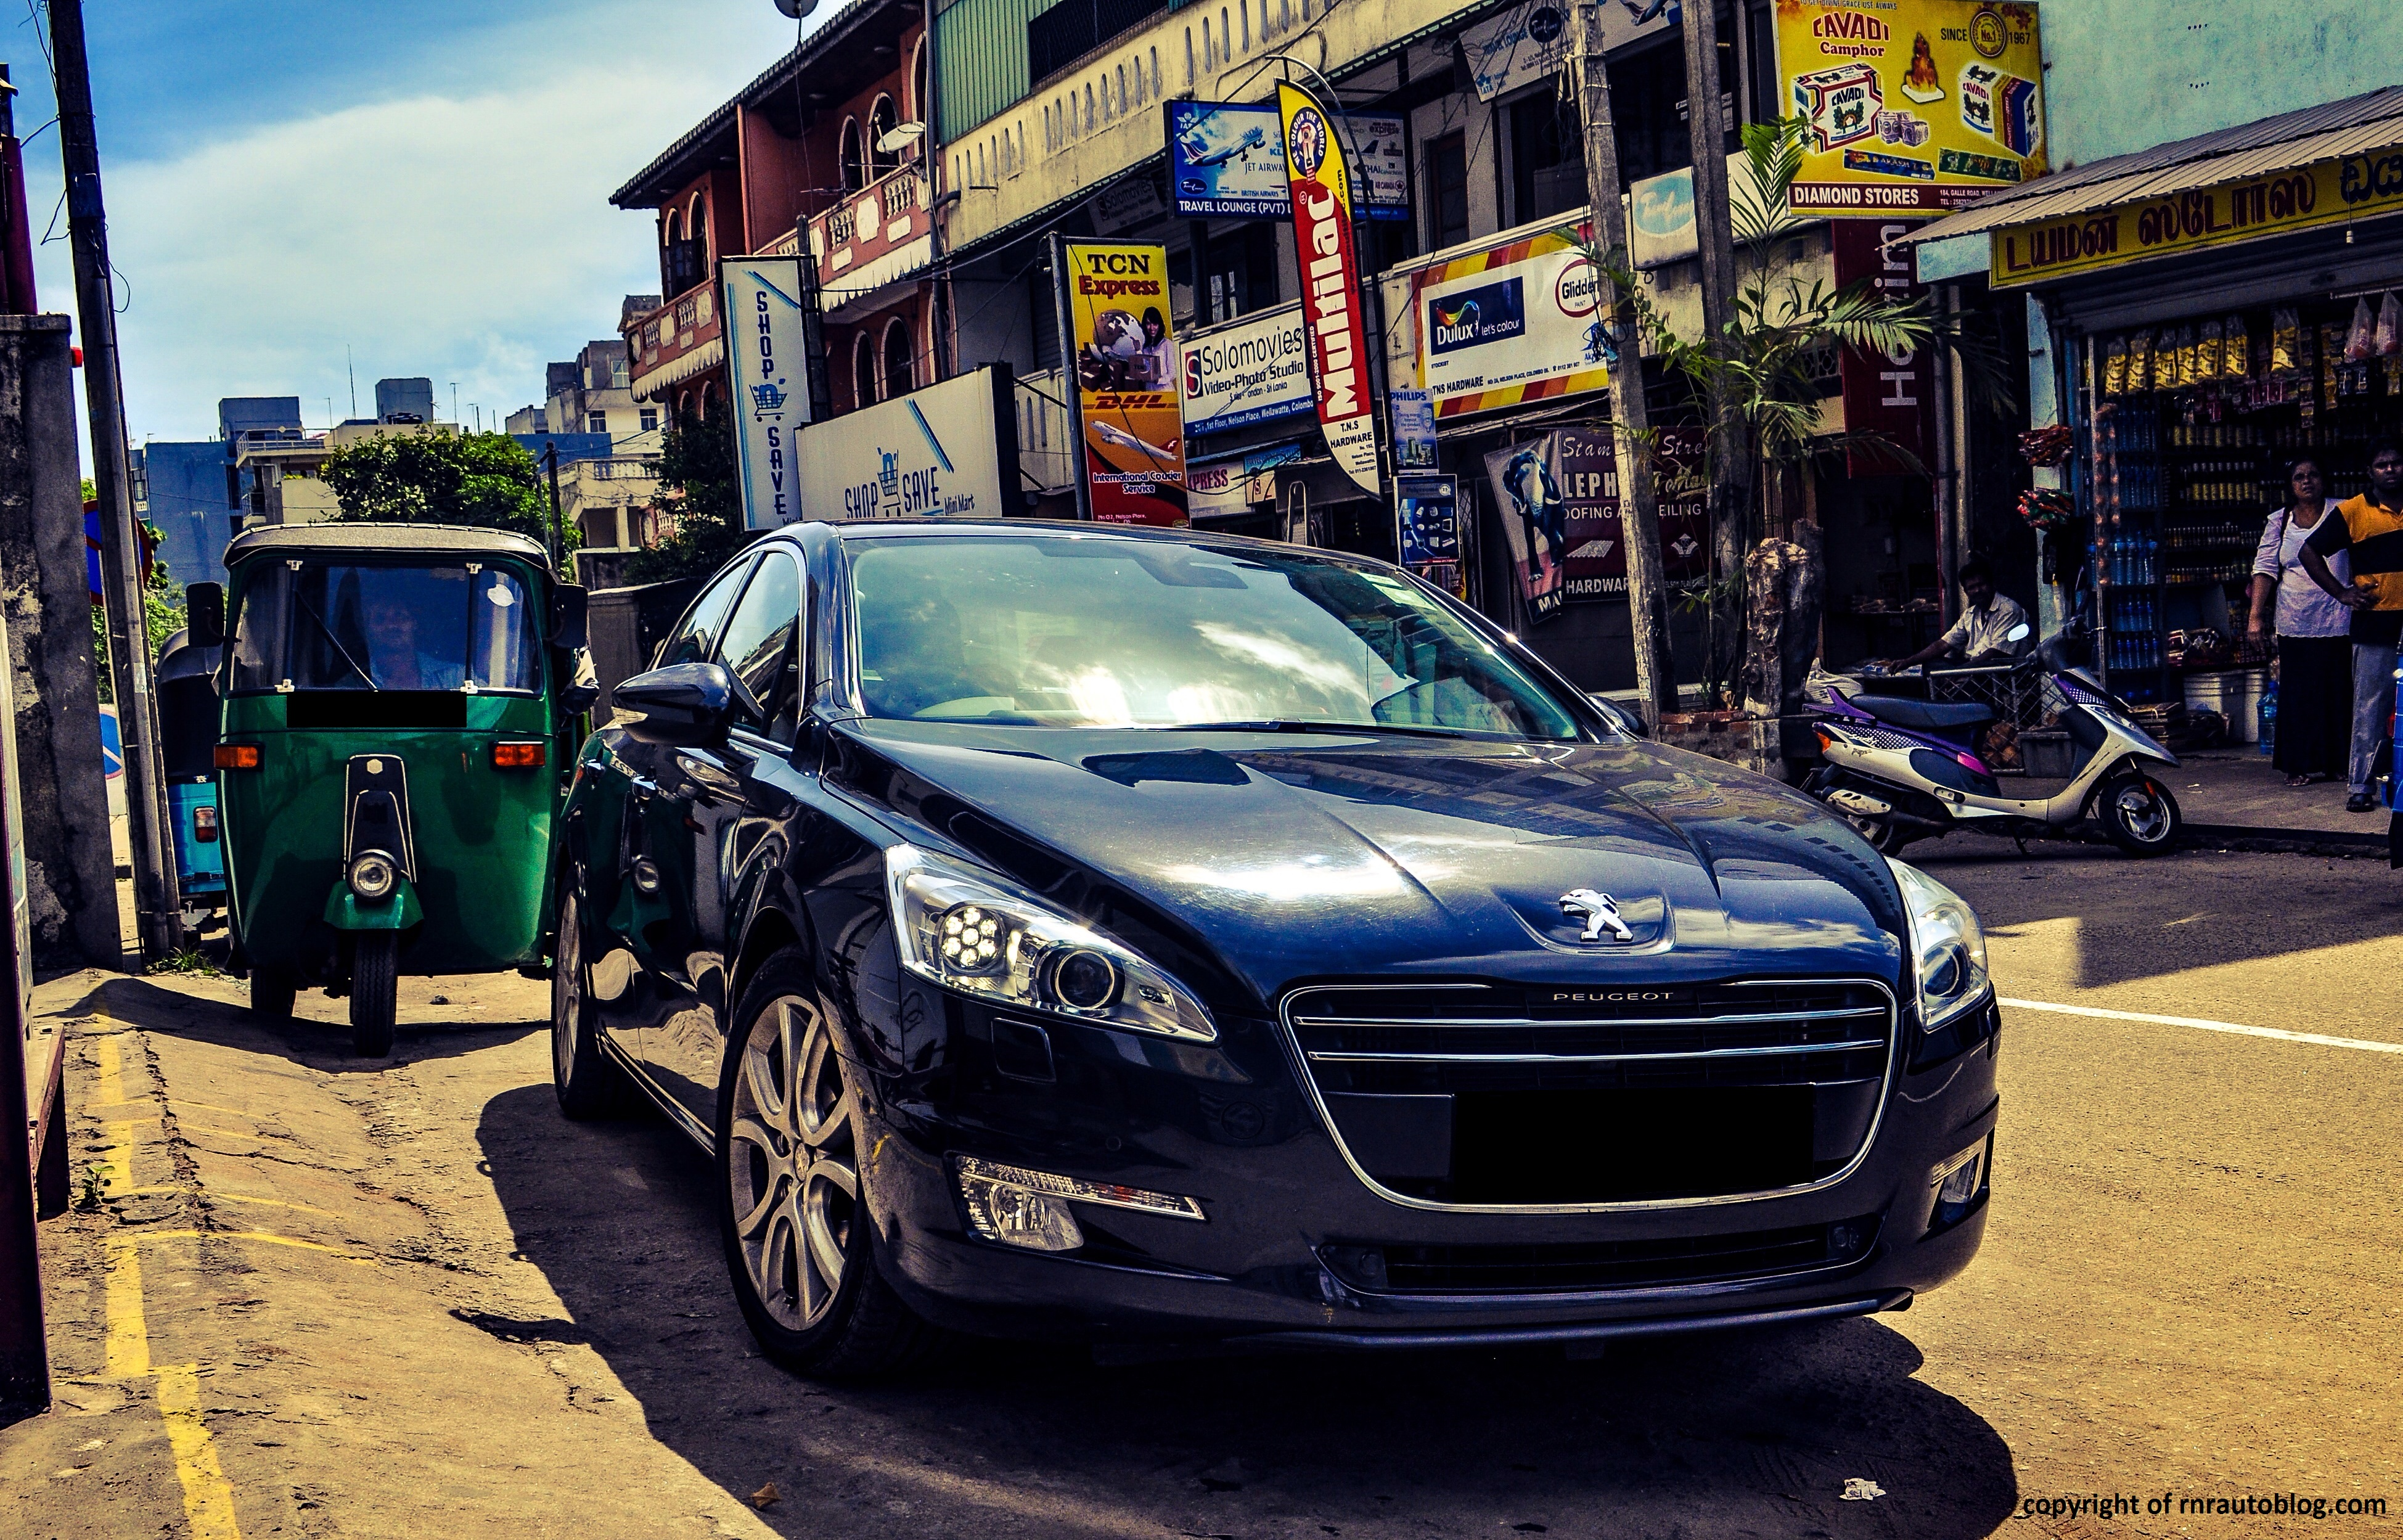 2013 Peugeot 508 Premium Teaser | RNR Automotive Blog